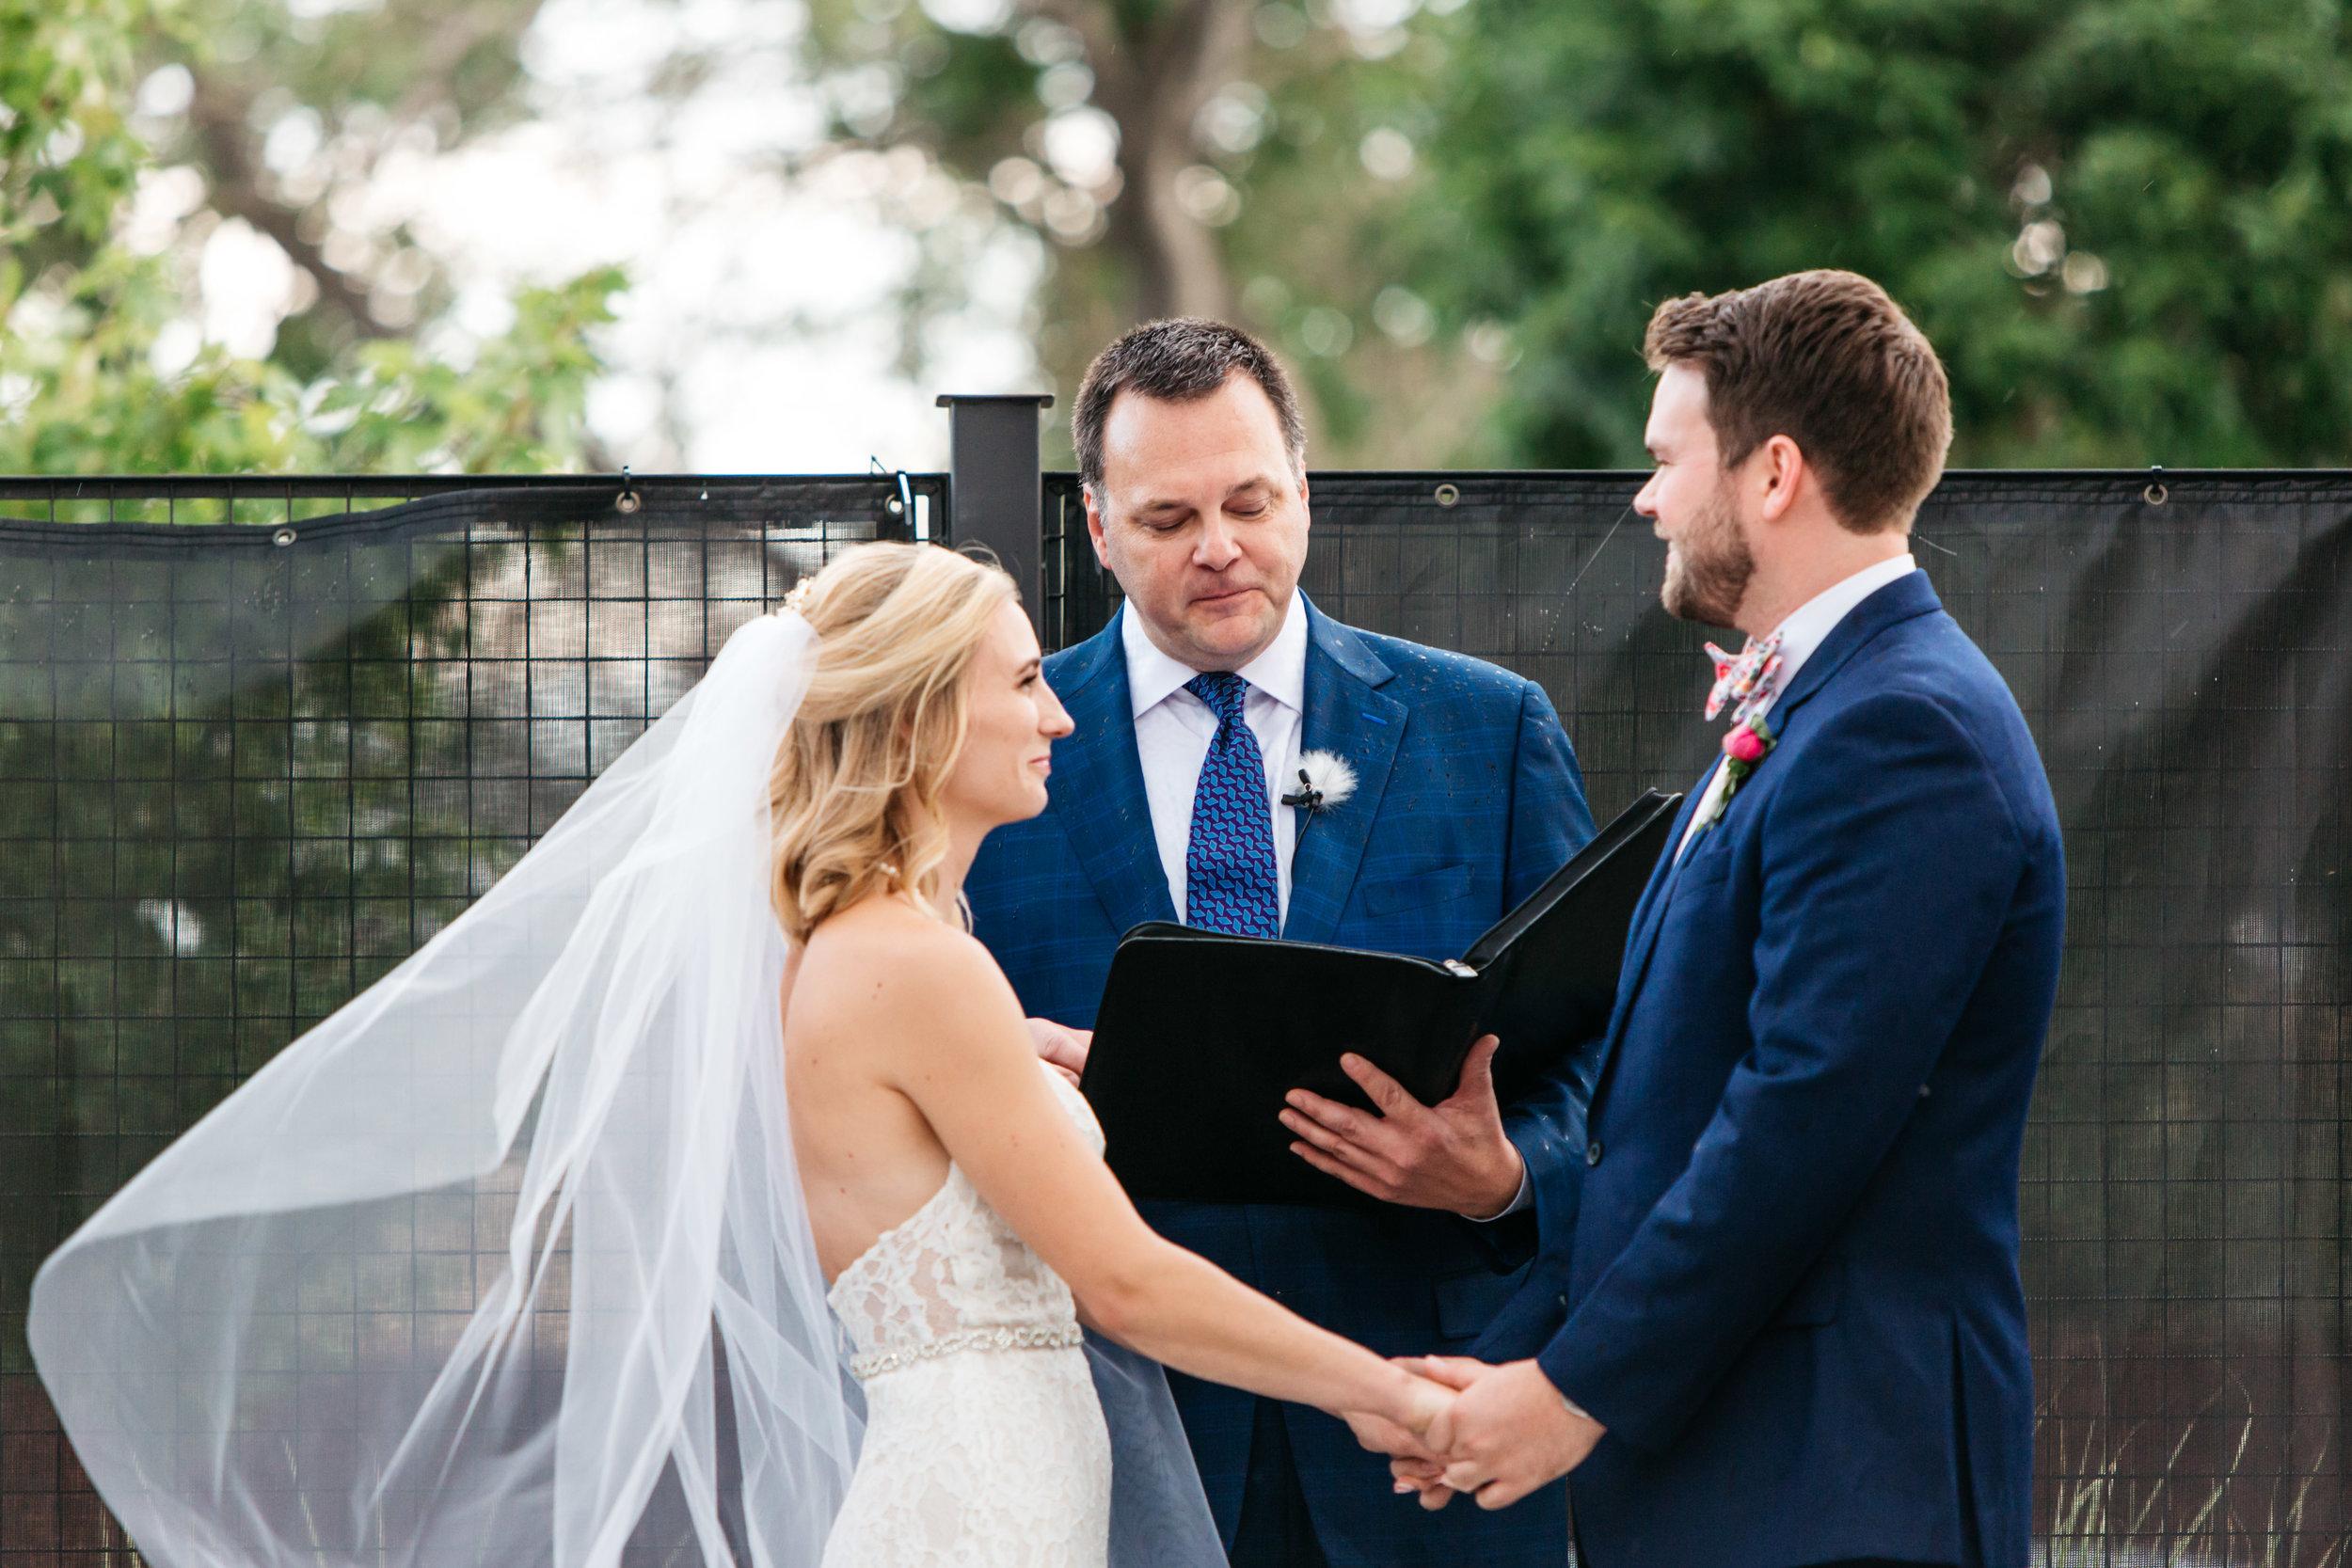 denver outdoor wedding ceremony